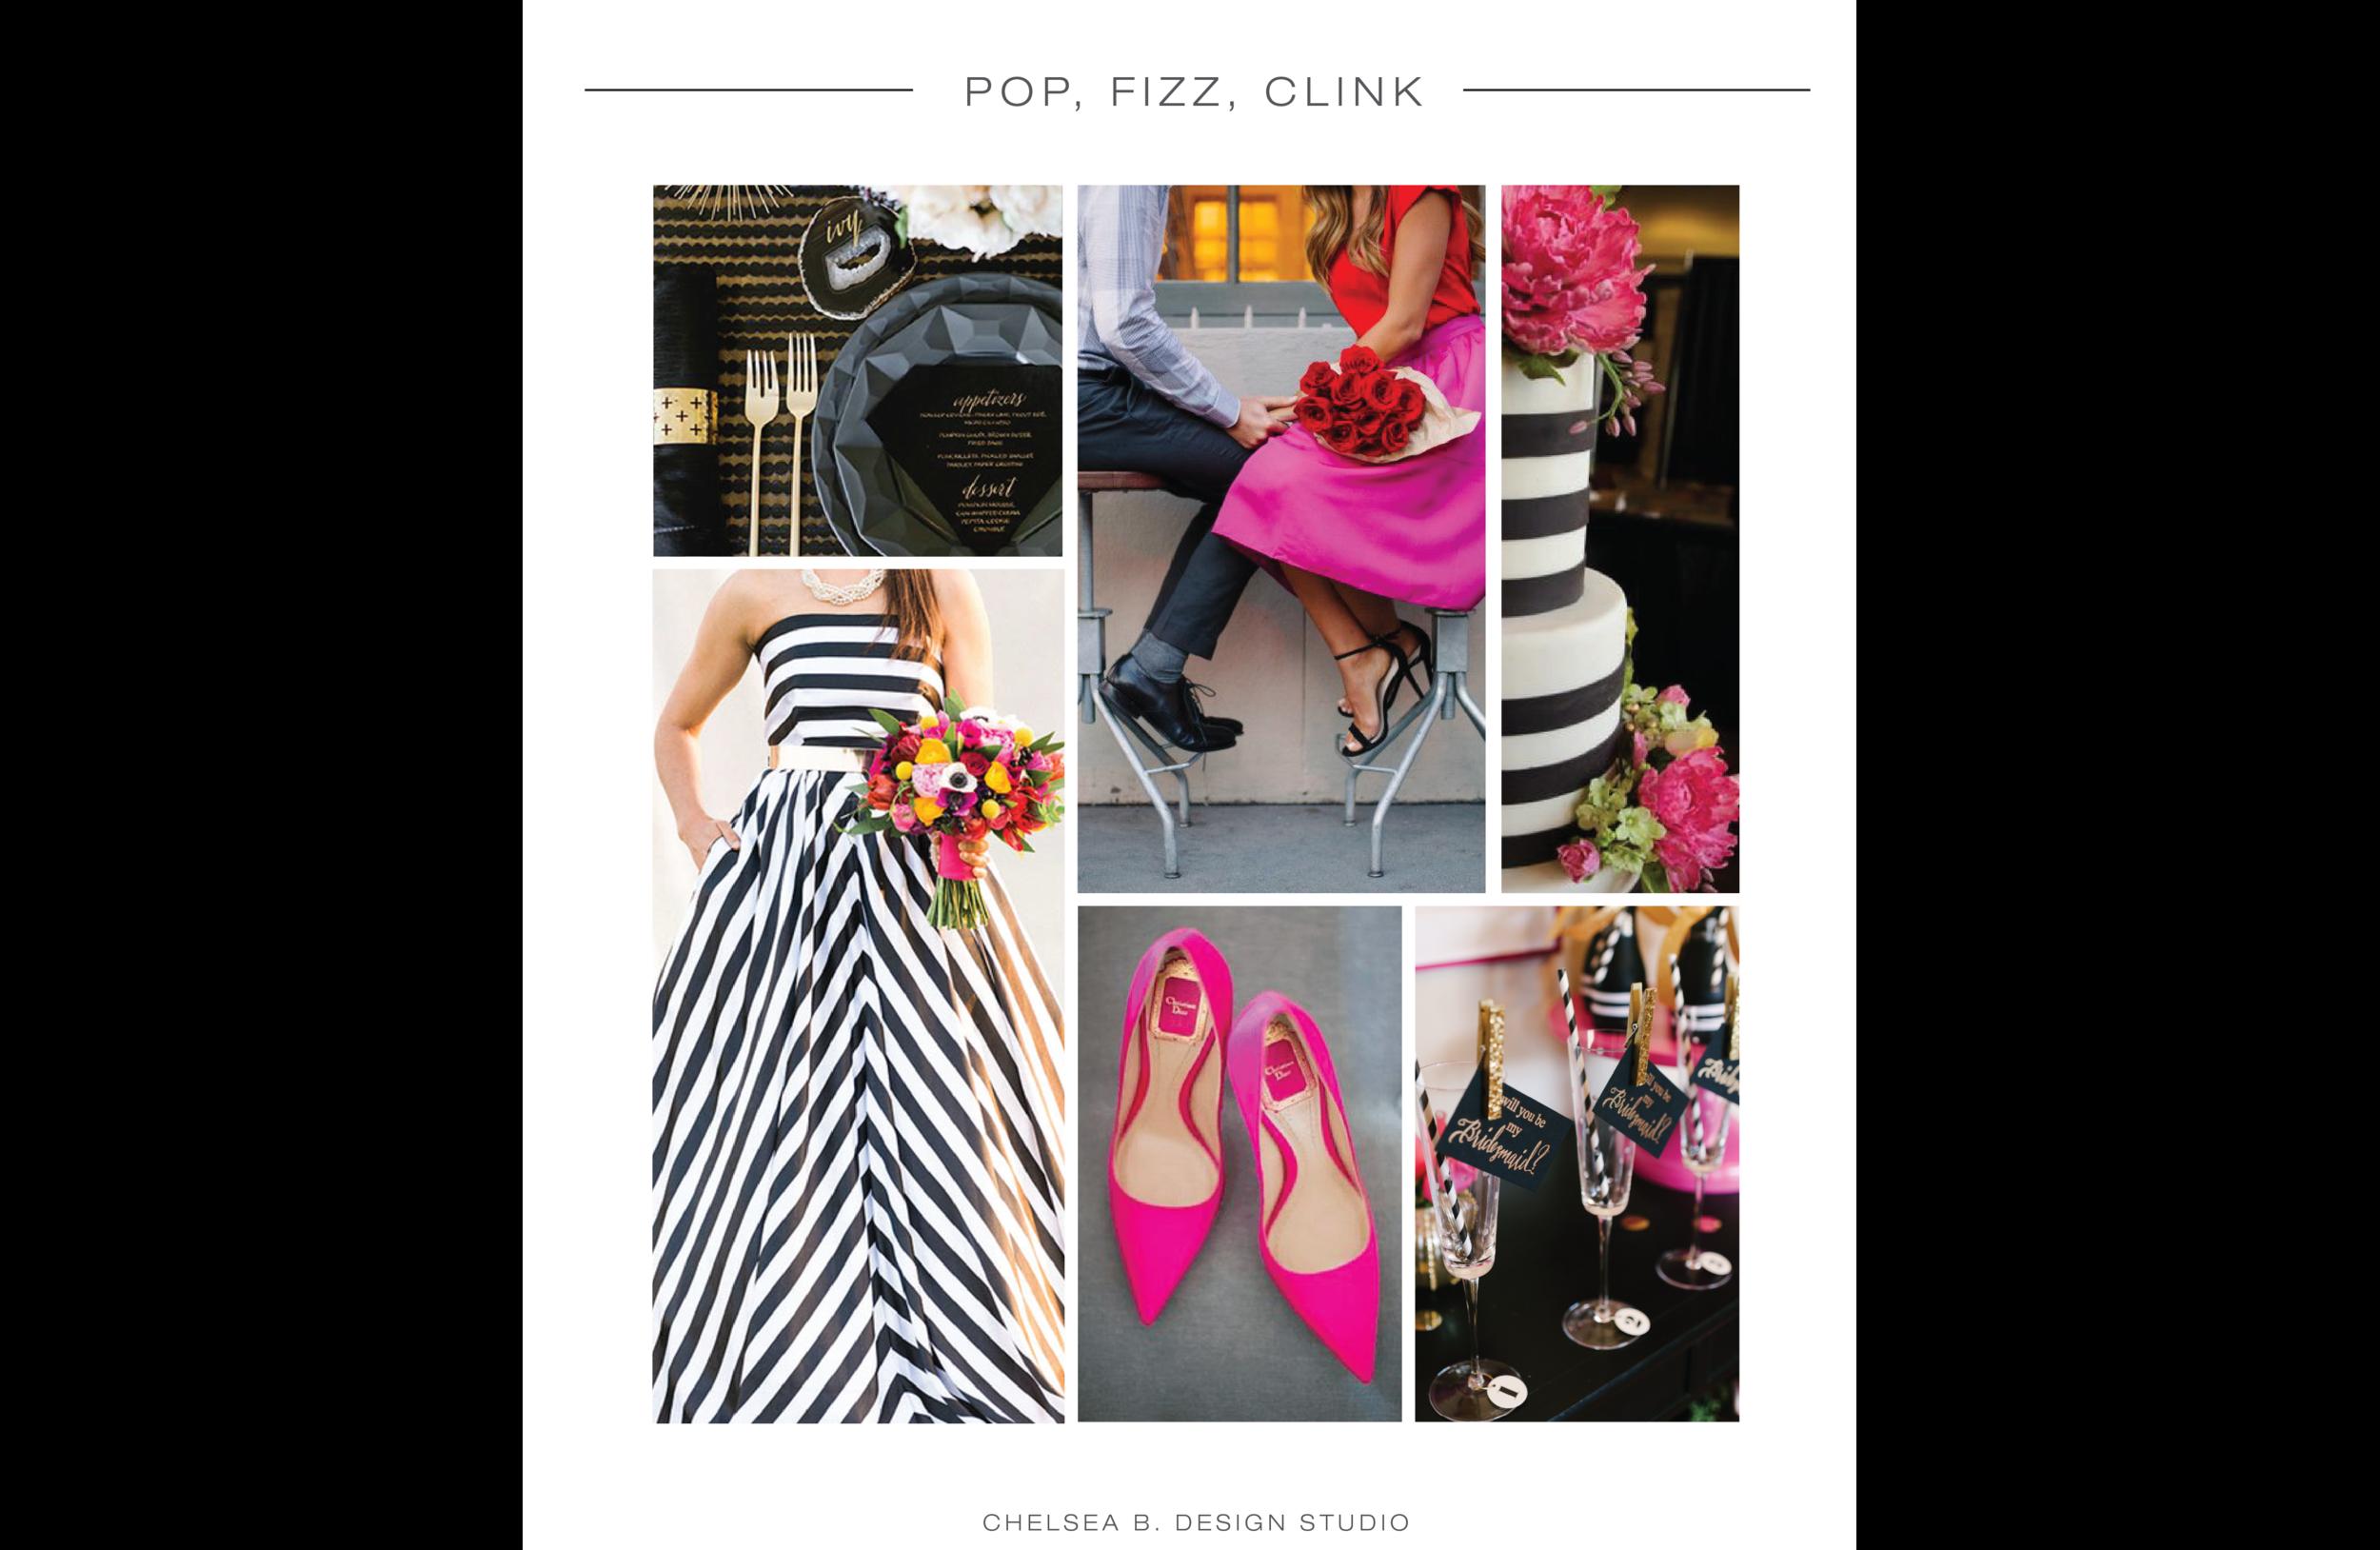 Tablescape  |  Couple  |  Cake  |  Dress  |  Heels  |  Glasses